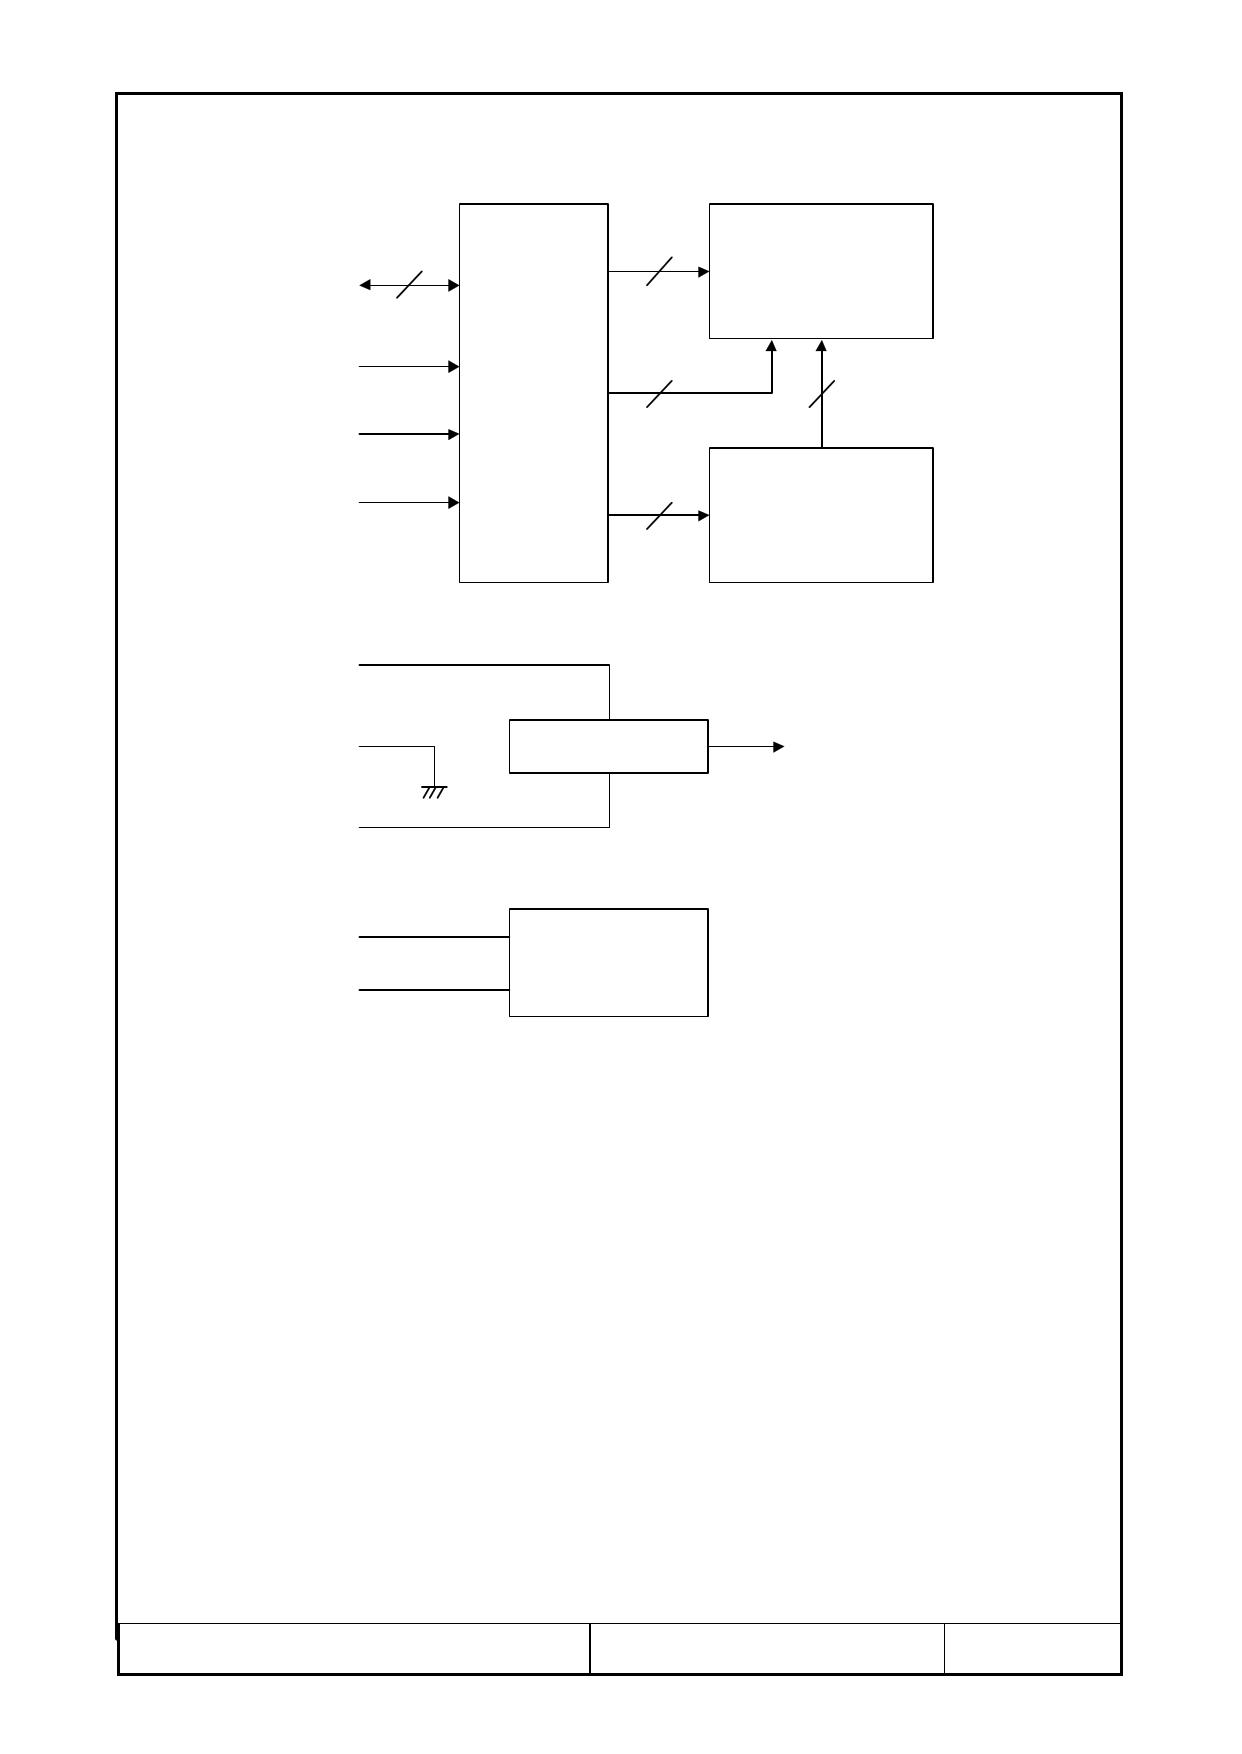 C-51505NJQJ-LR-AG arduino